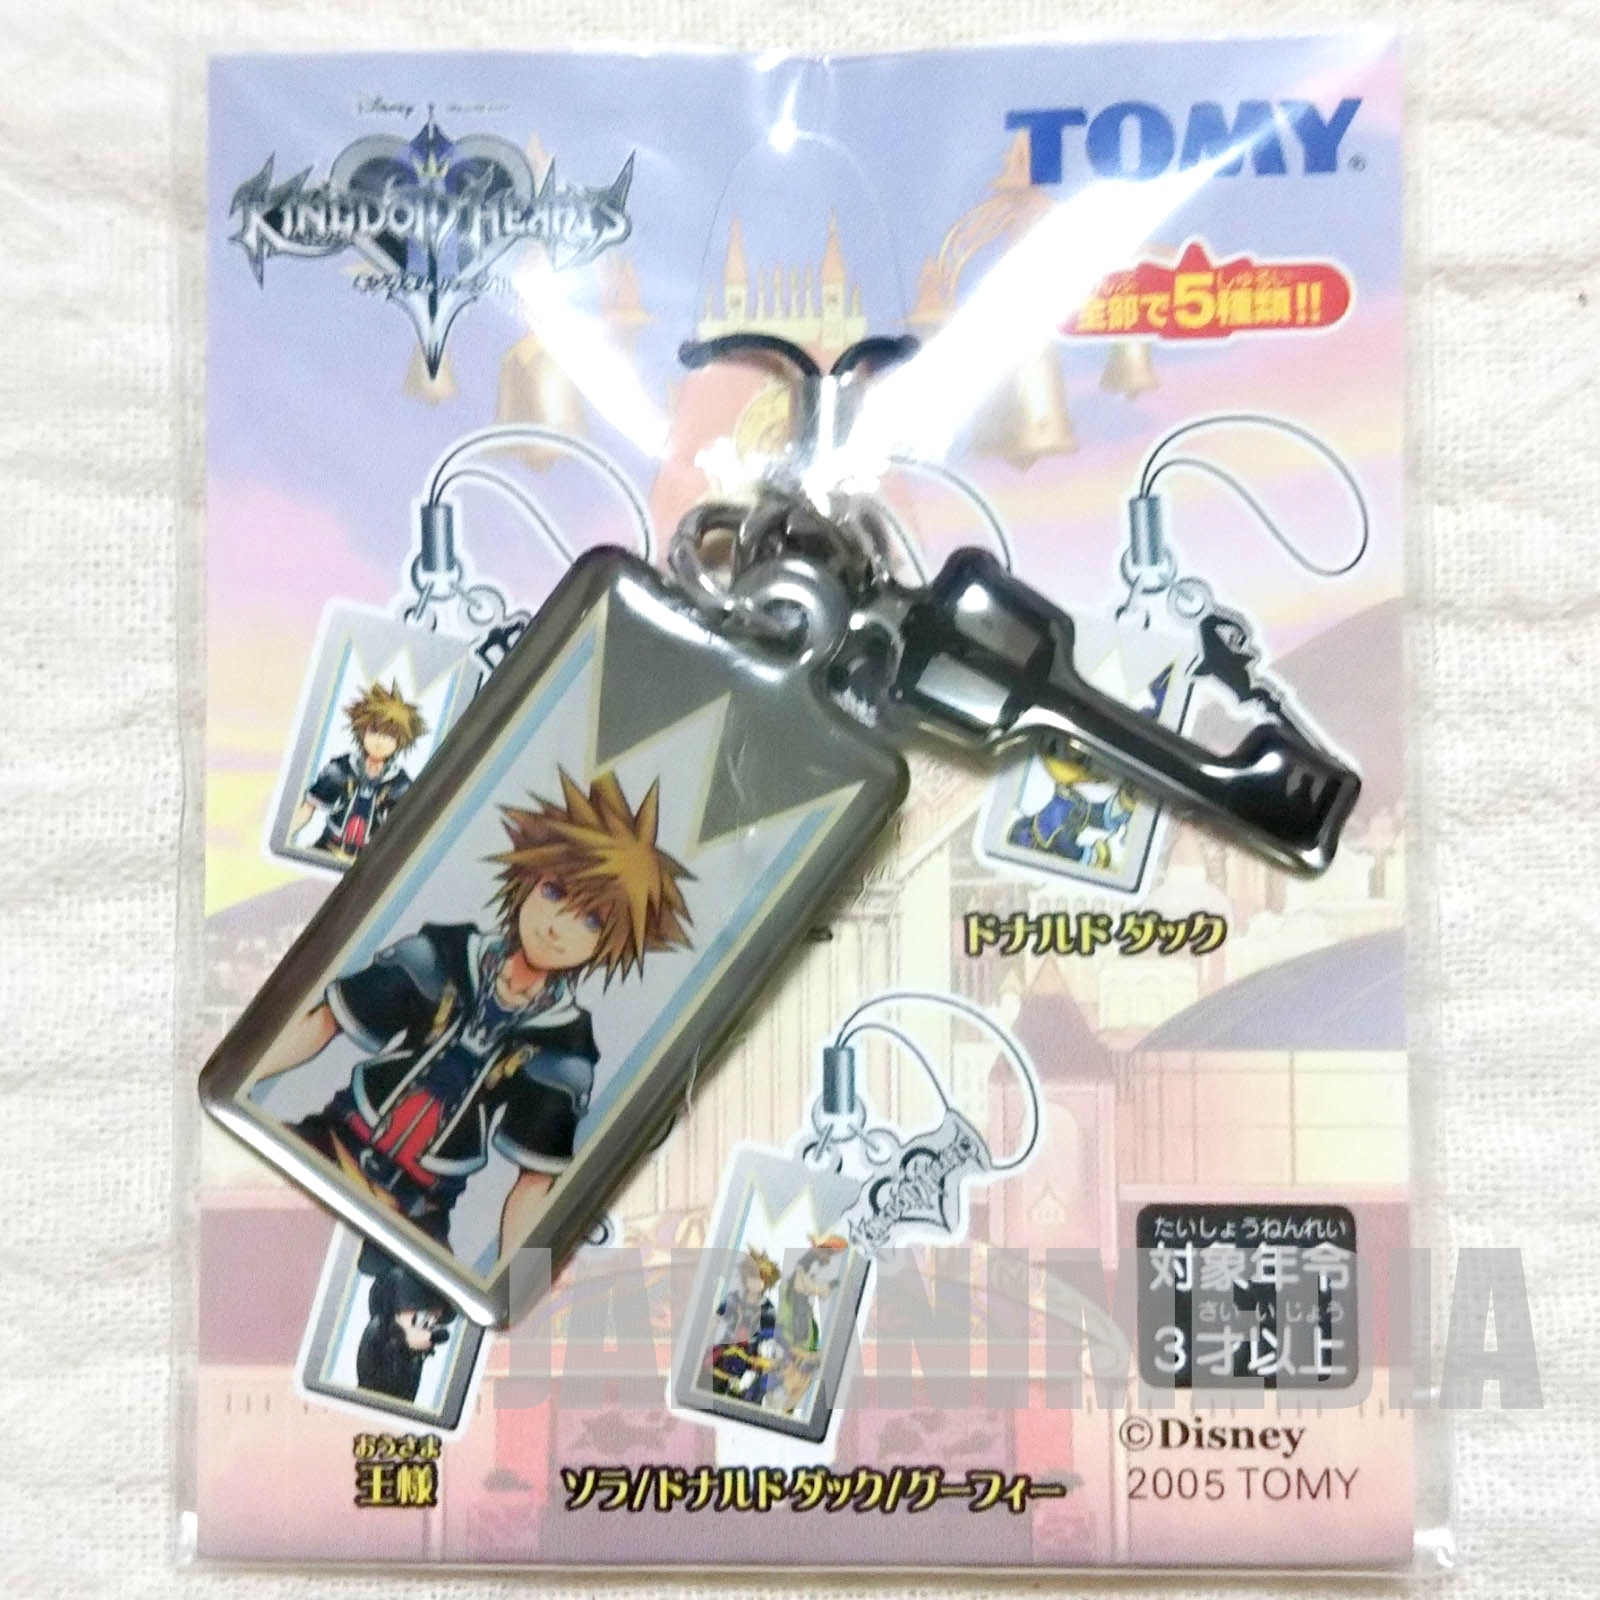 Kingdom Hearts 2 Sora Charm Strap Square Enix JAPAN GAME